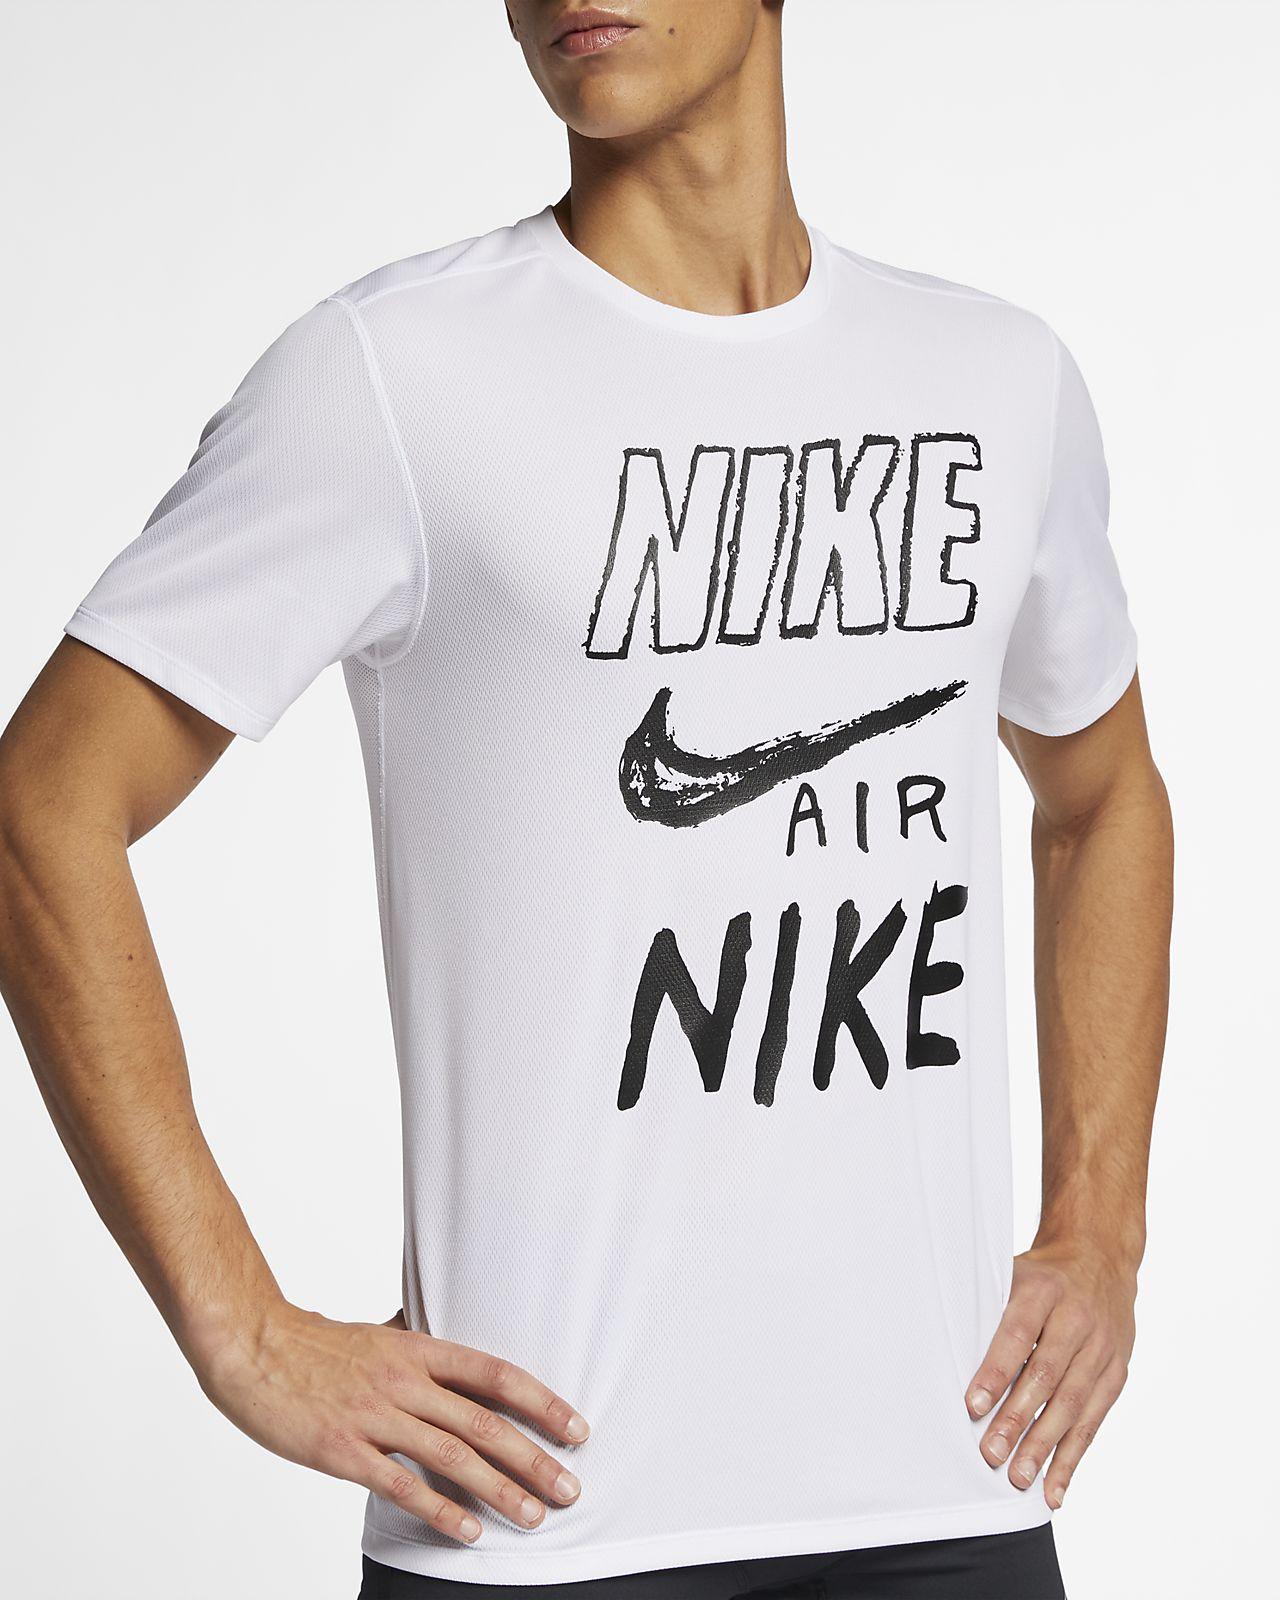 e1bbb97d Nike Breathe Men's Graphic Running Top. Nike.com LU